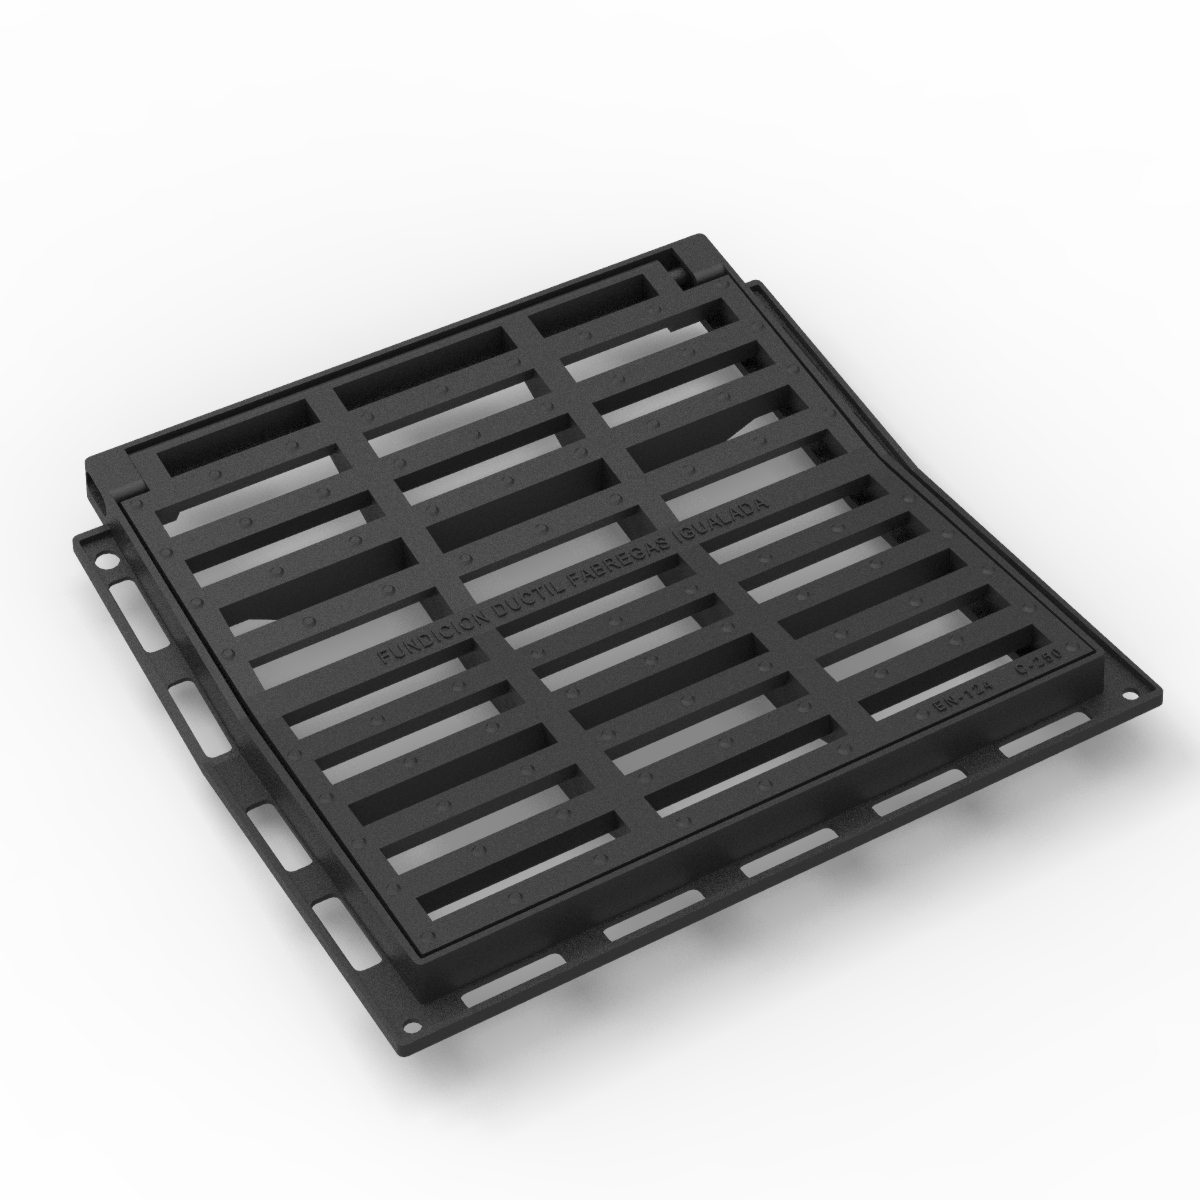 Reja y marco en V Cuadrada imbornal abatible en fundicion D-12C-V